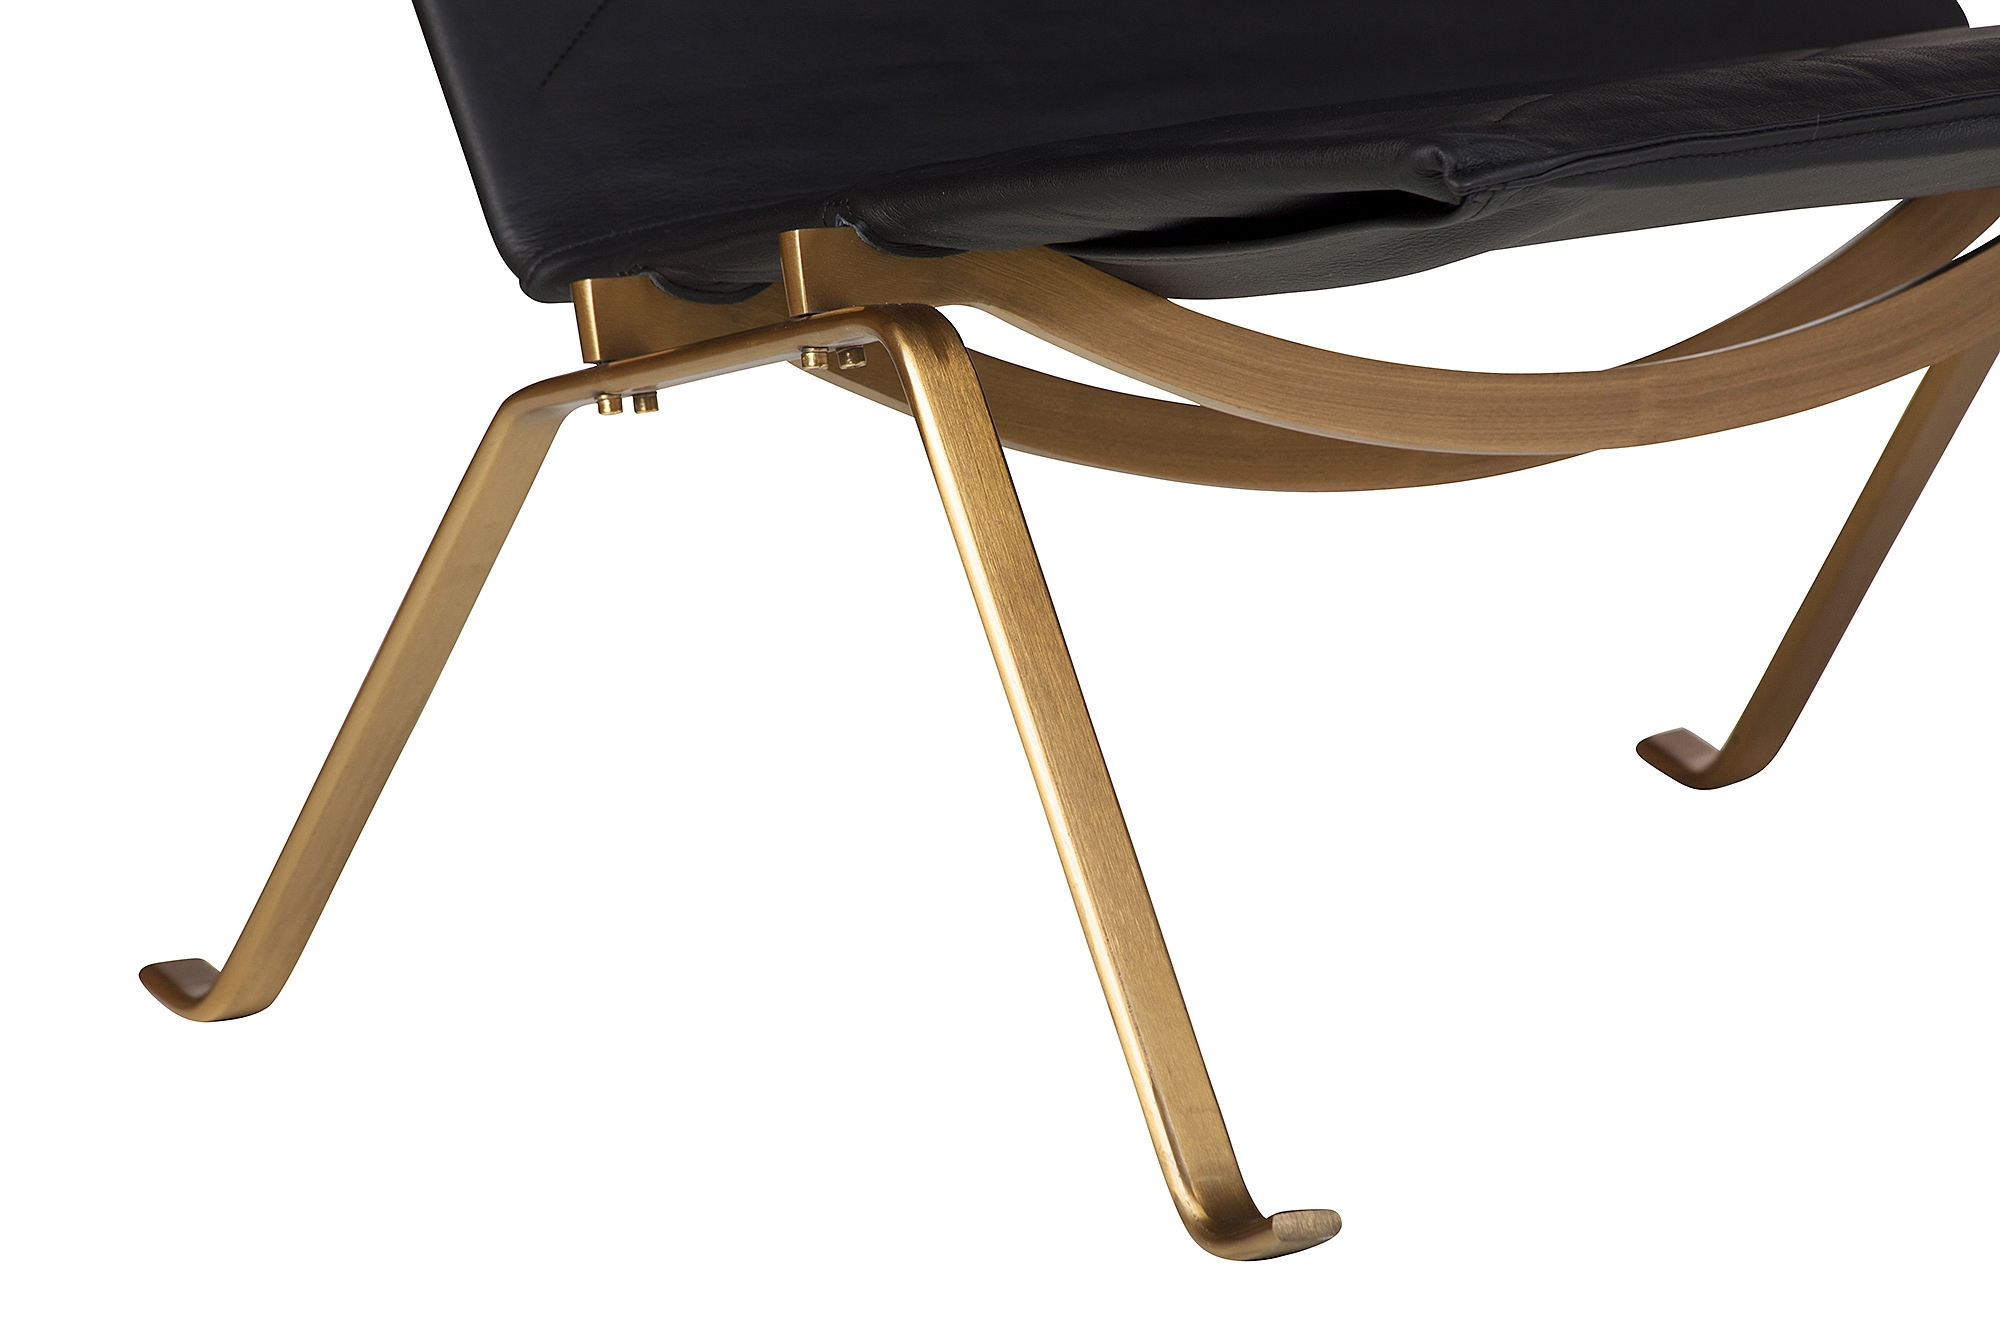 Outstanding Pk22 Style Easy Chair In Black Leather And Gold Inzonedesignstudio Interior Chair Design Inzonedesignstudiocom